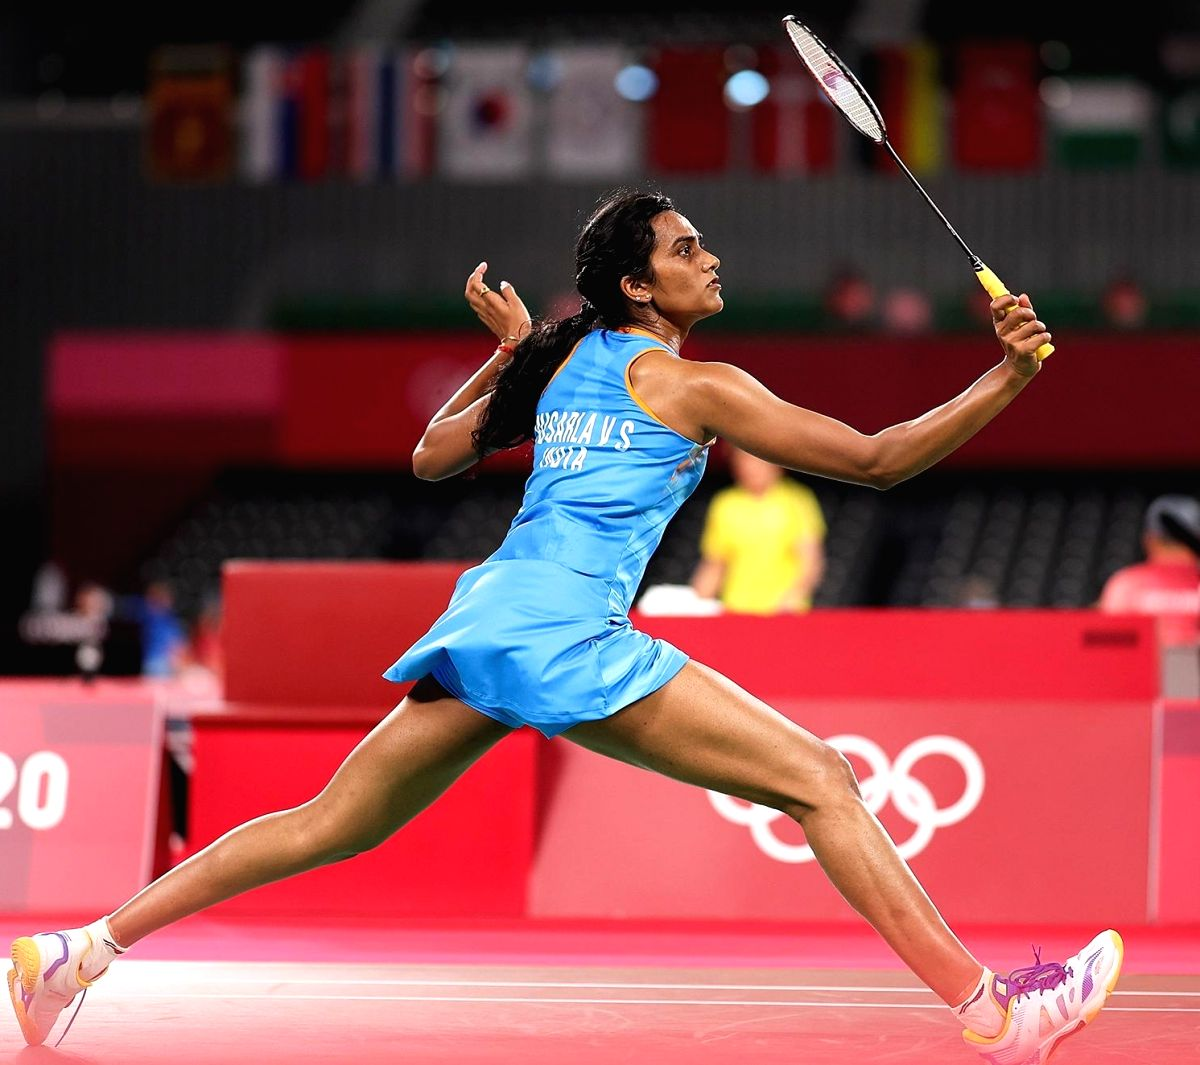 Olympics: PV Sindhu storms into women's singles quarterfinals (ld)